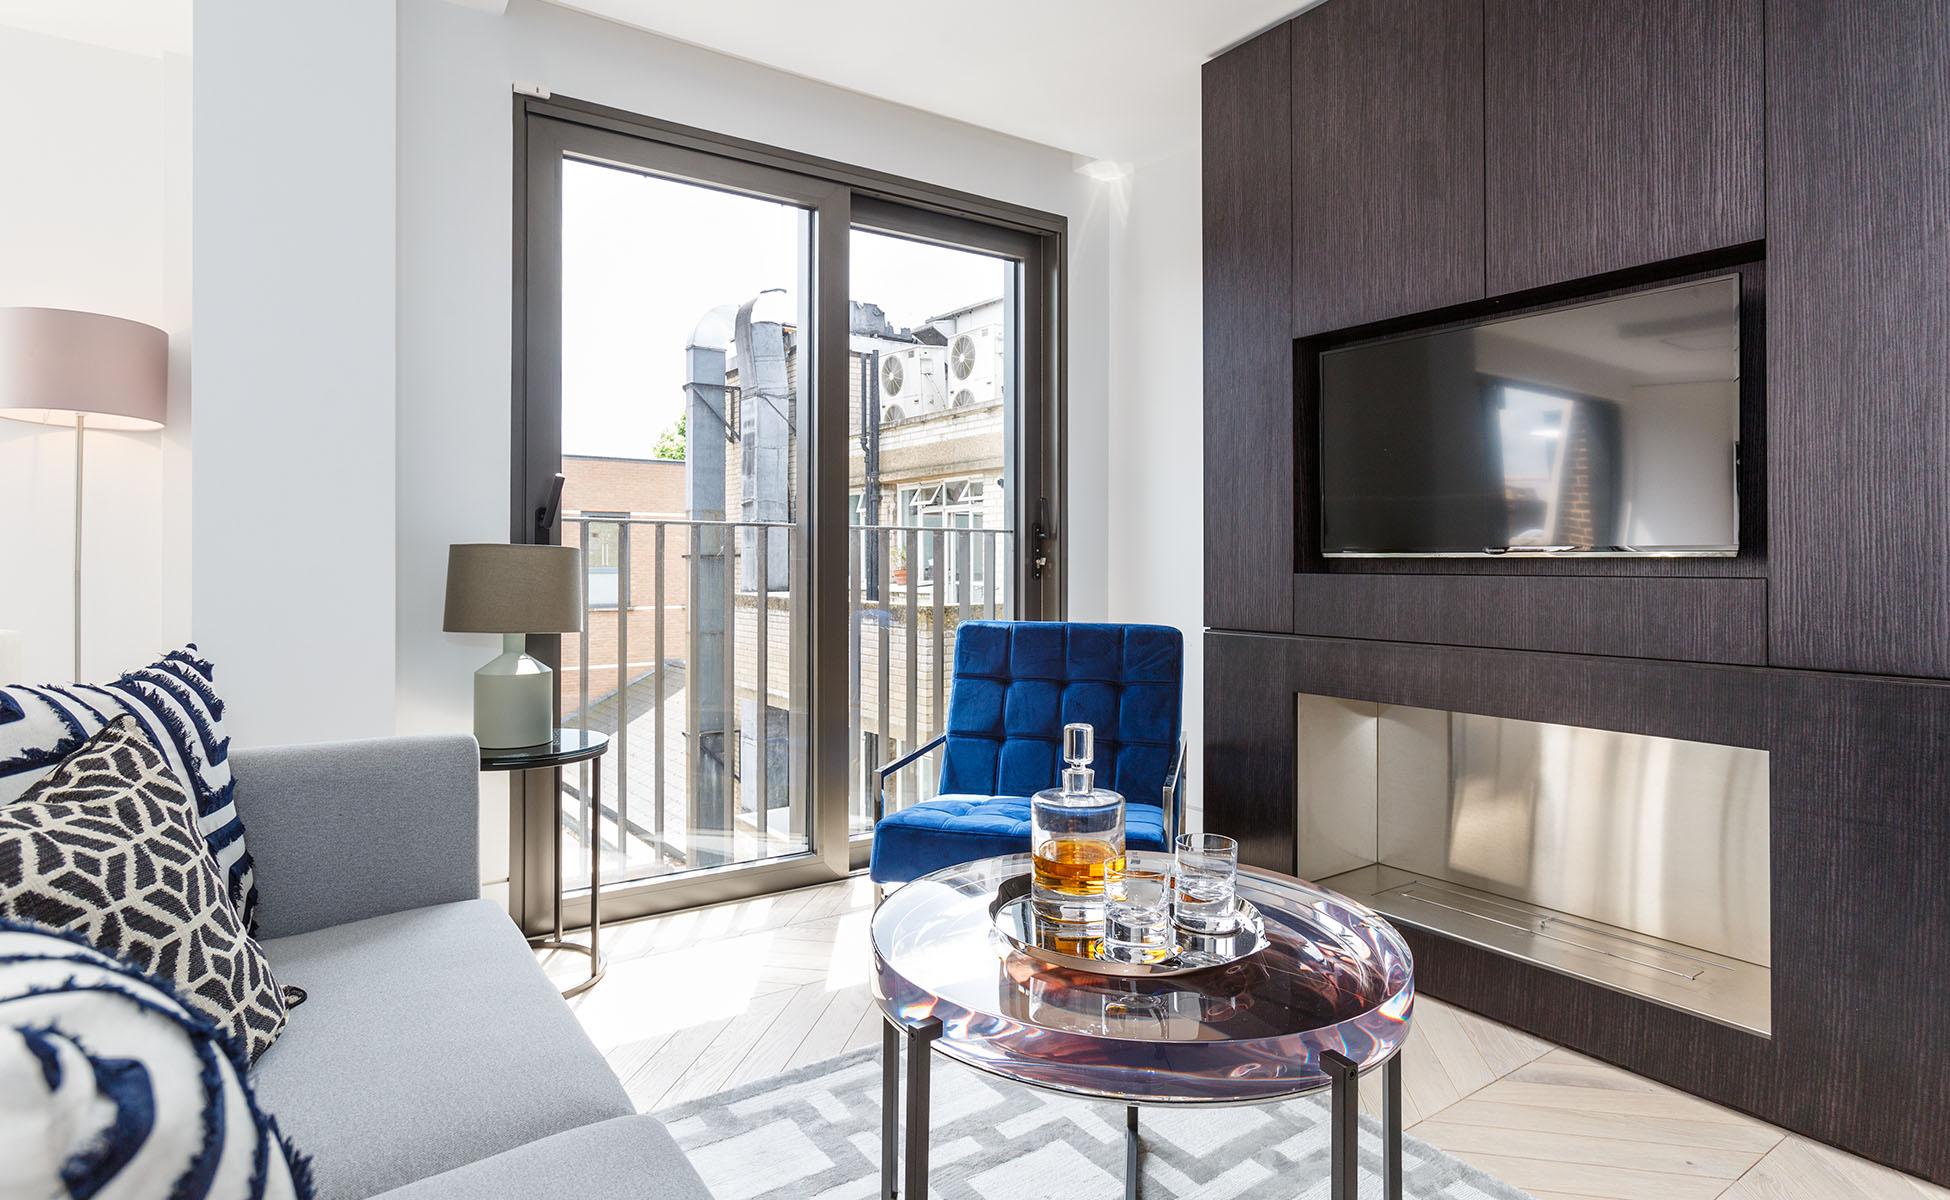 Lovelydays luxury service apartment rental - London - Fitzrovia - Newman Street IV - Lovelysuite - 2 bedrooms - 2 bathrooms - Luxury living room - rent luxury apartment london - 3d0ab947f657 - Lovelydays